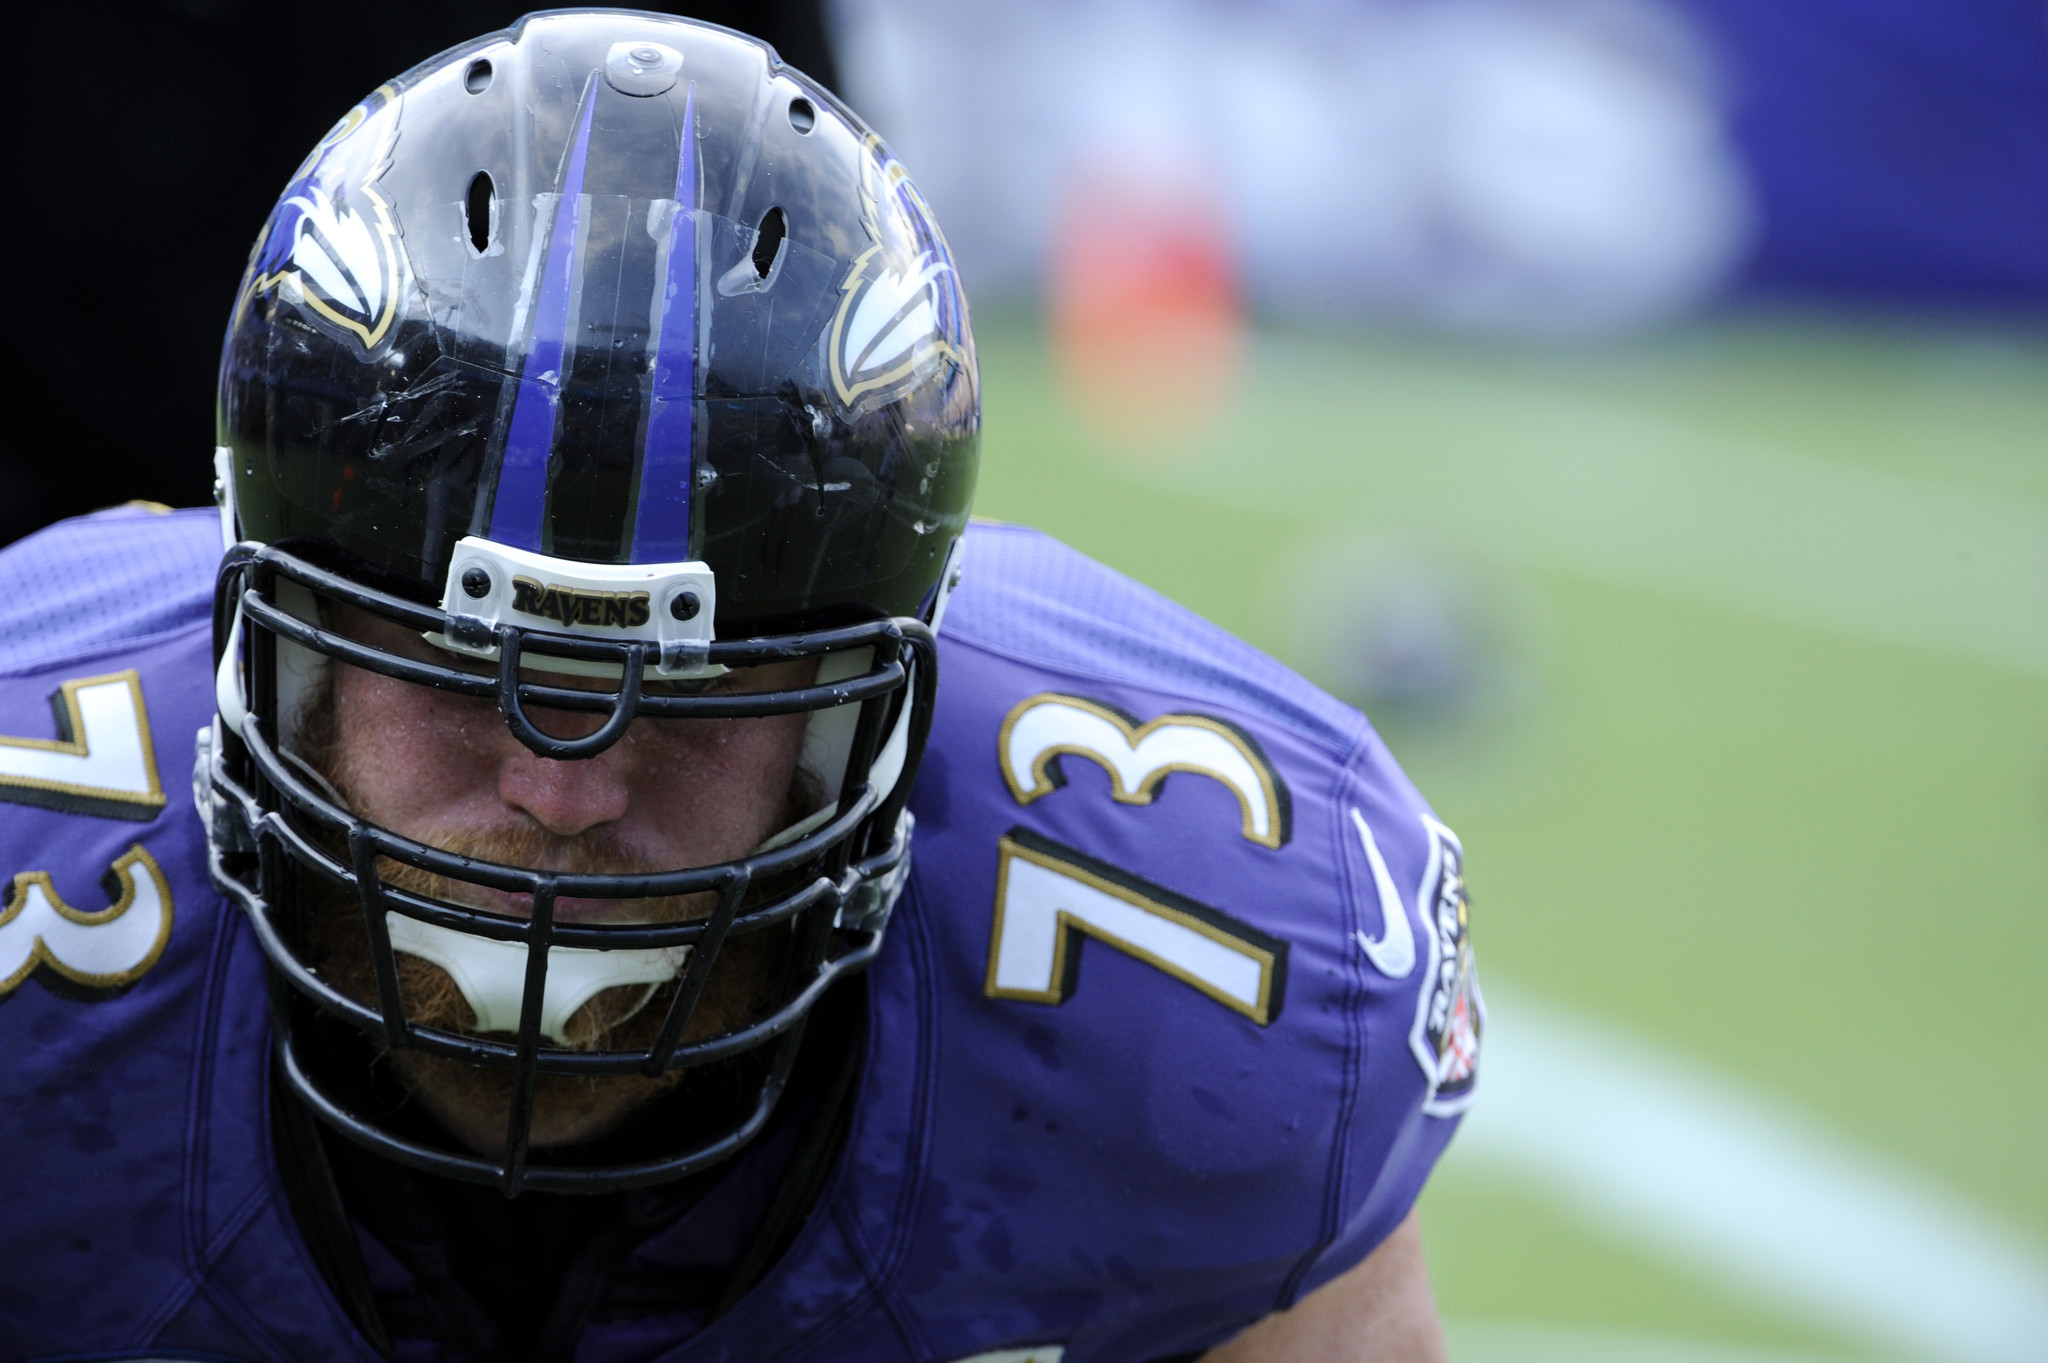 Ravens deactivate injured offensive linemen Marshal Yanda and